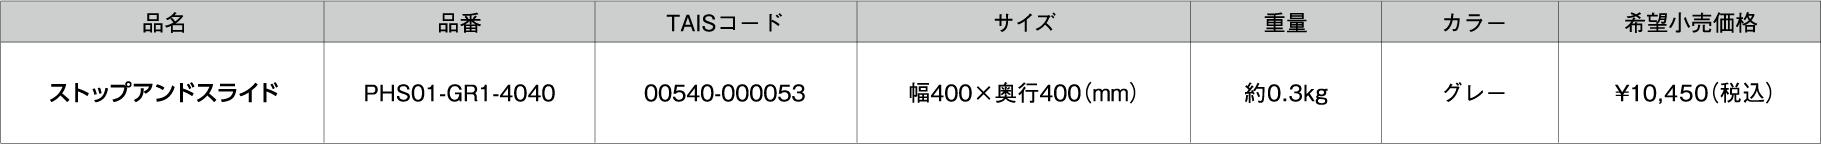 STOP & SLIDE 仕様/価格